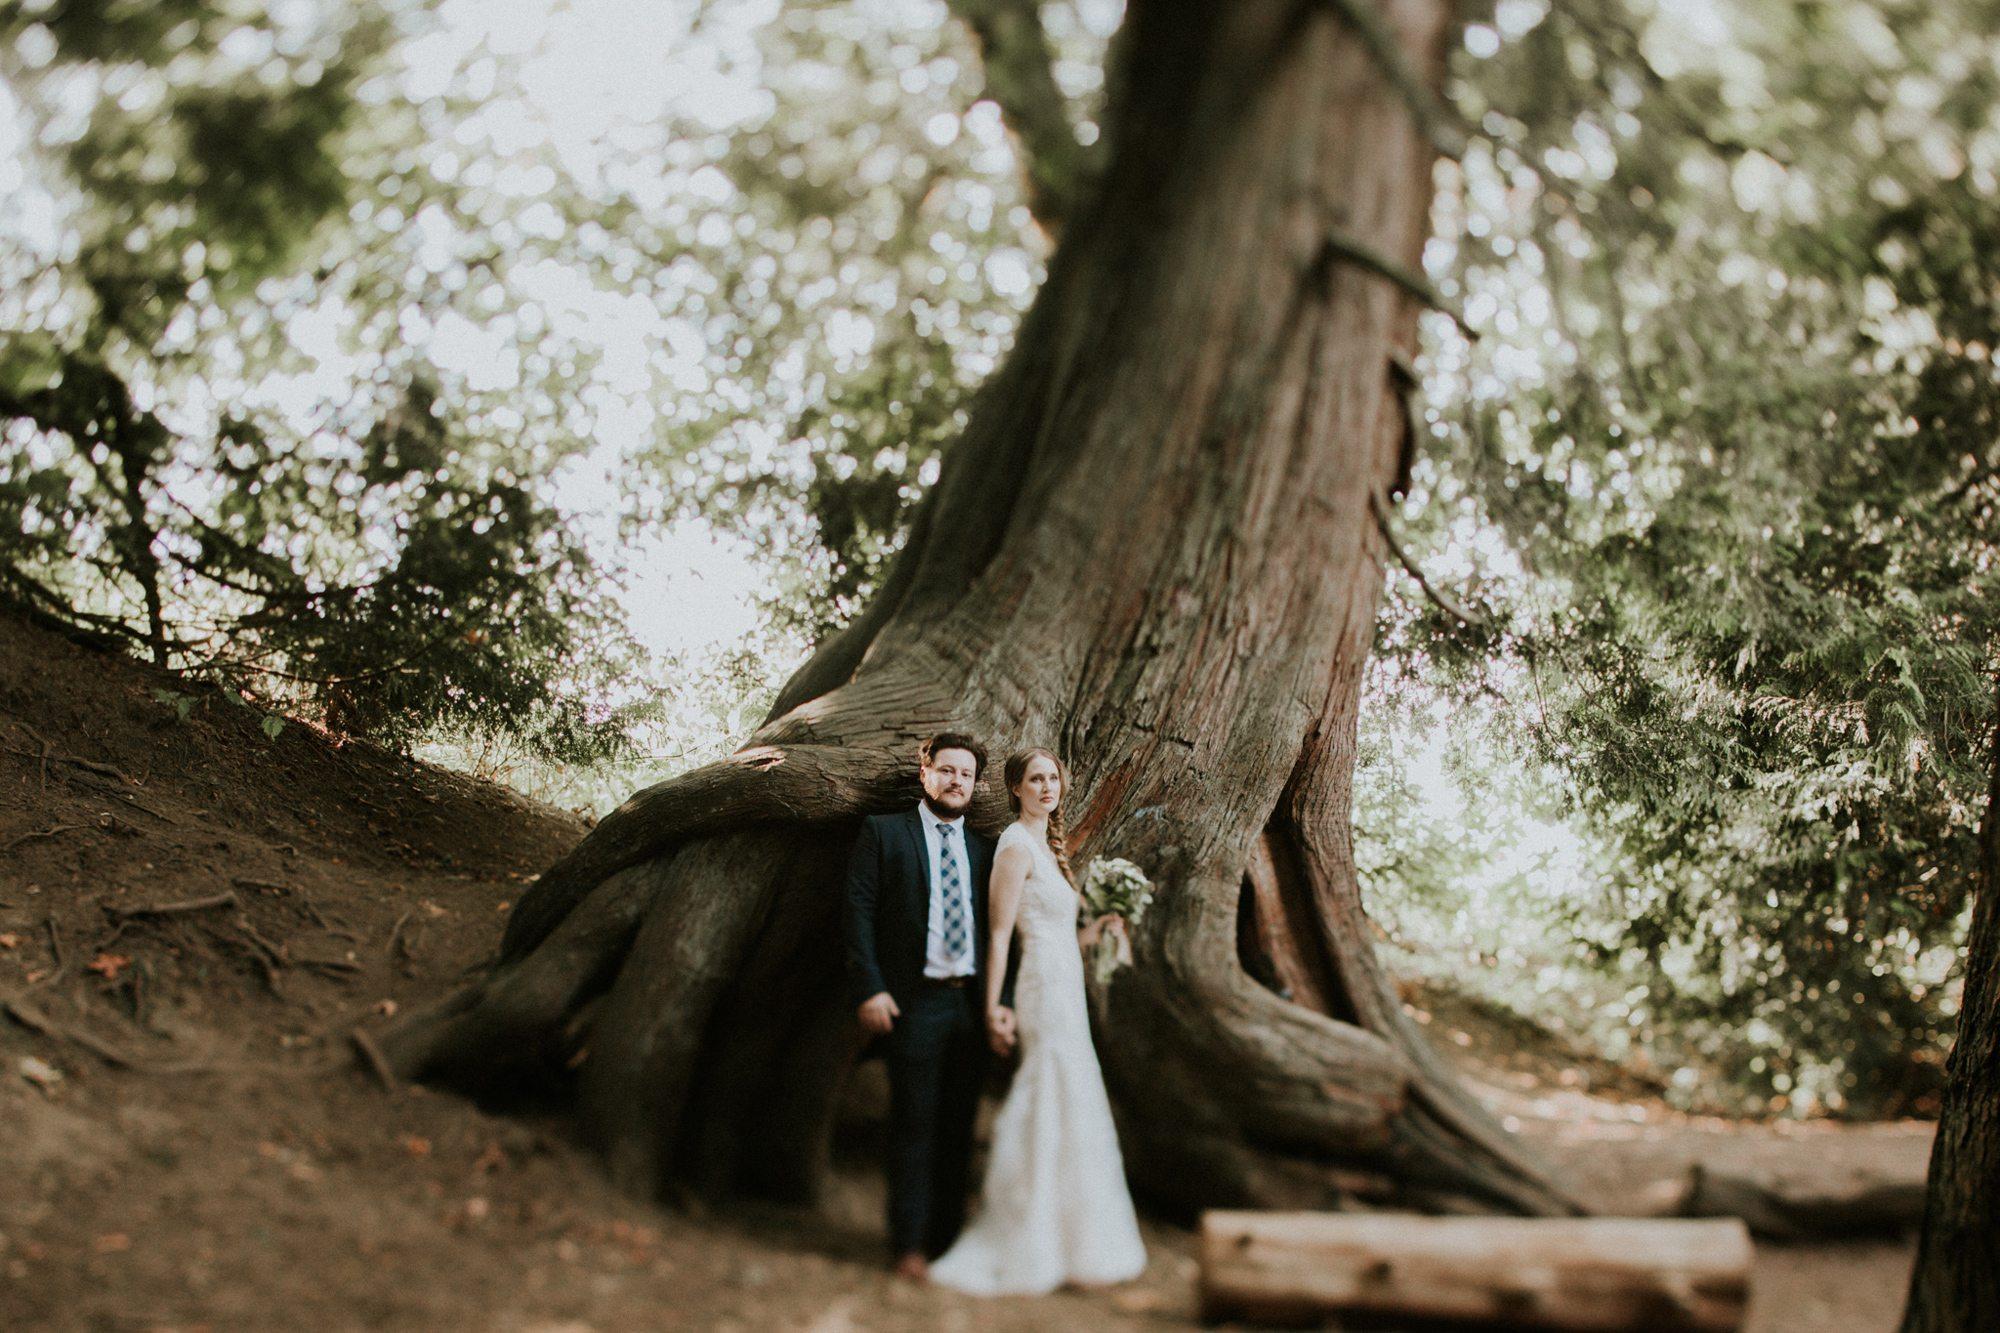 865-abbotsford-wedding-photographer